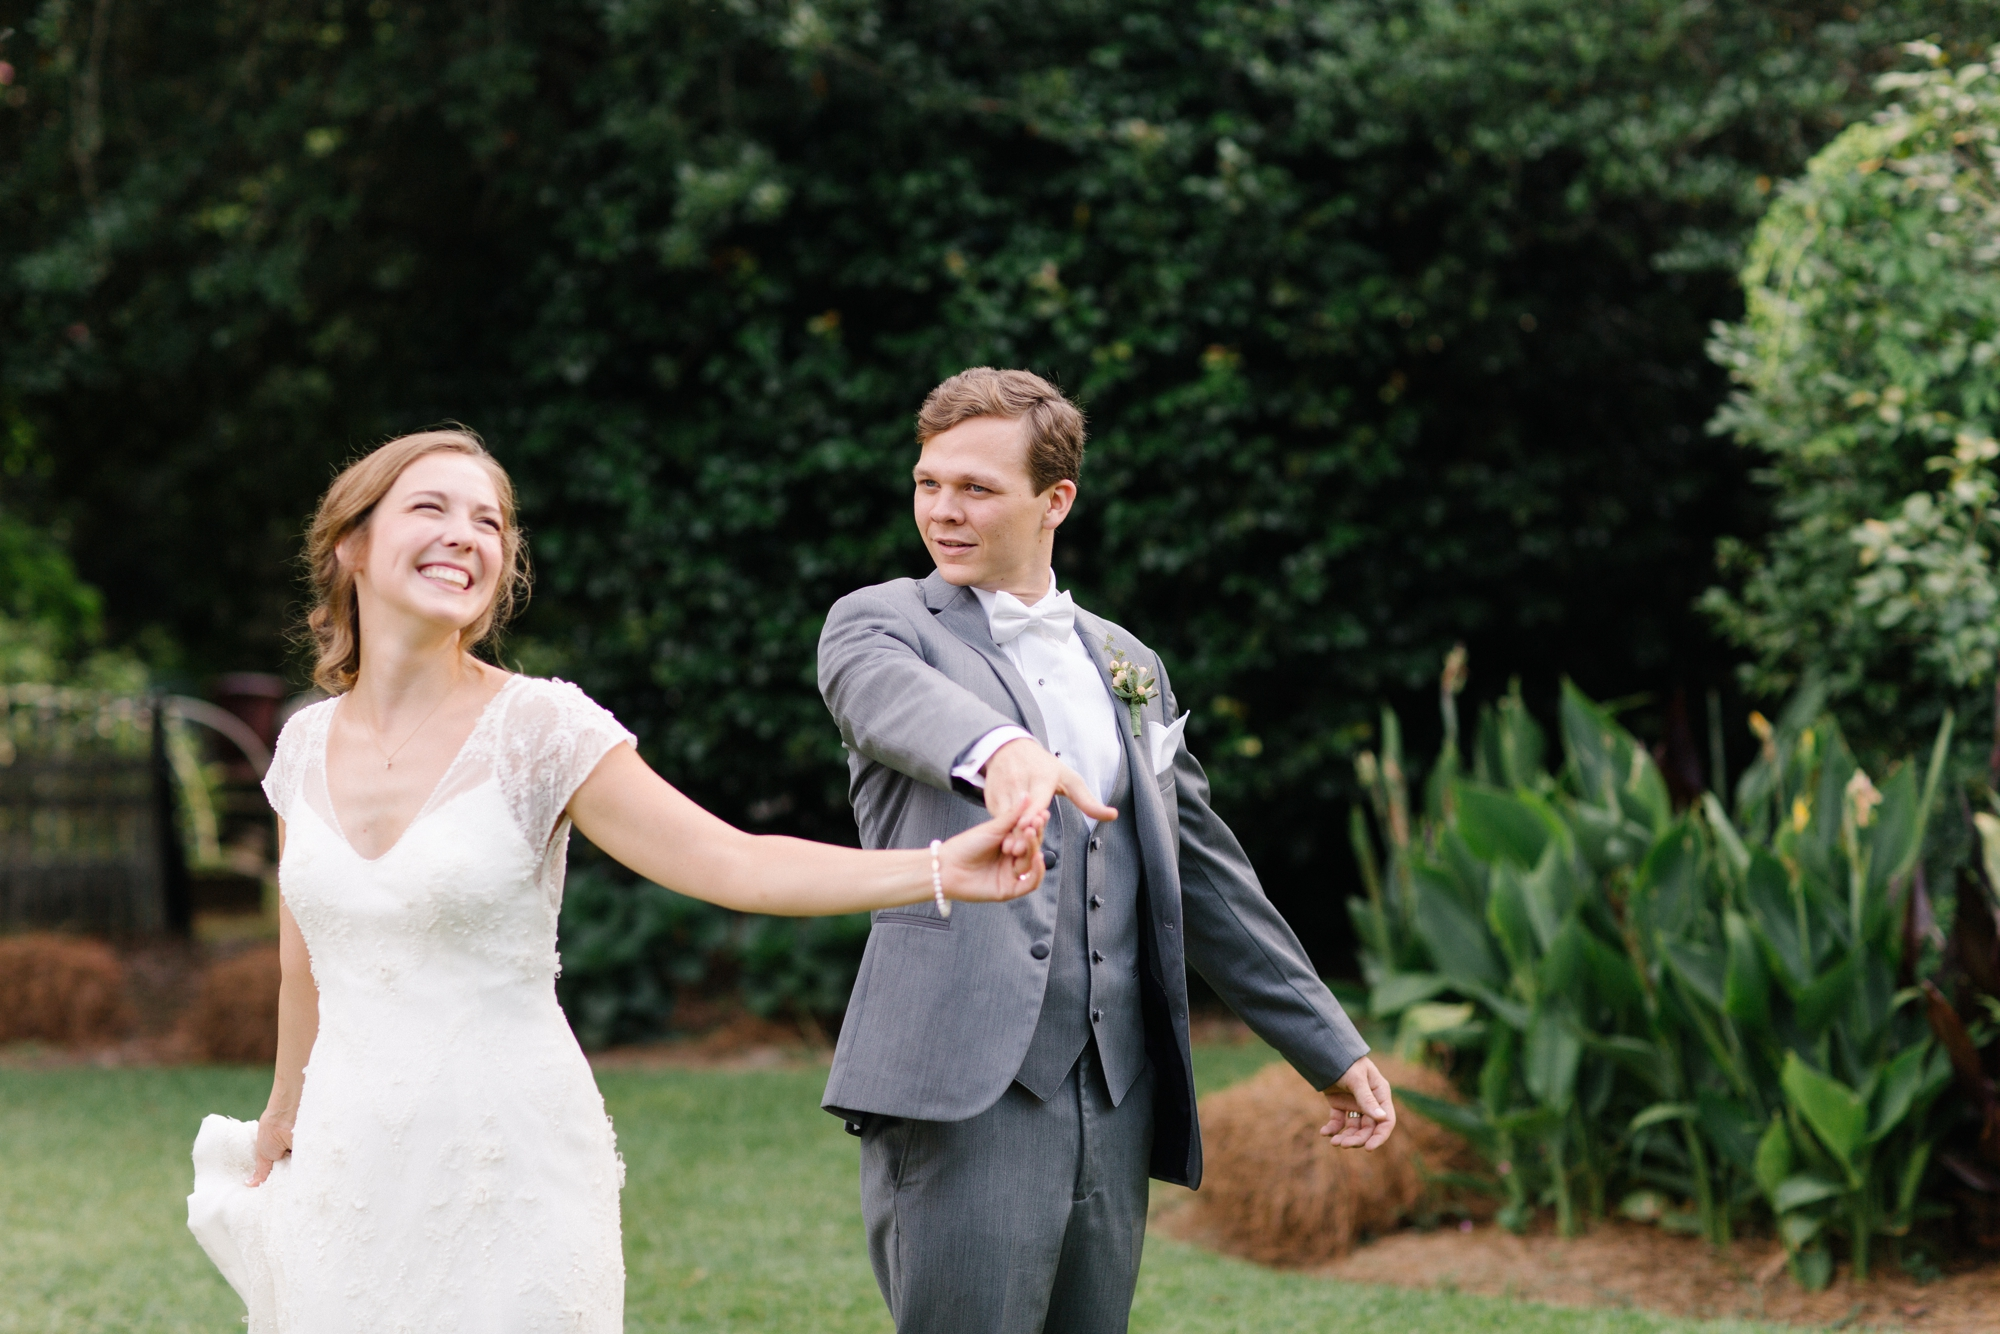 New_Orleans_Wedding_Photographer_1657.jpg